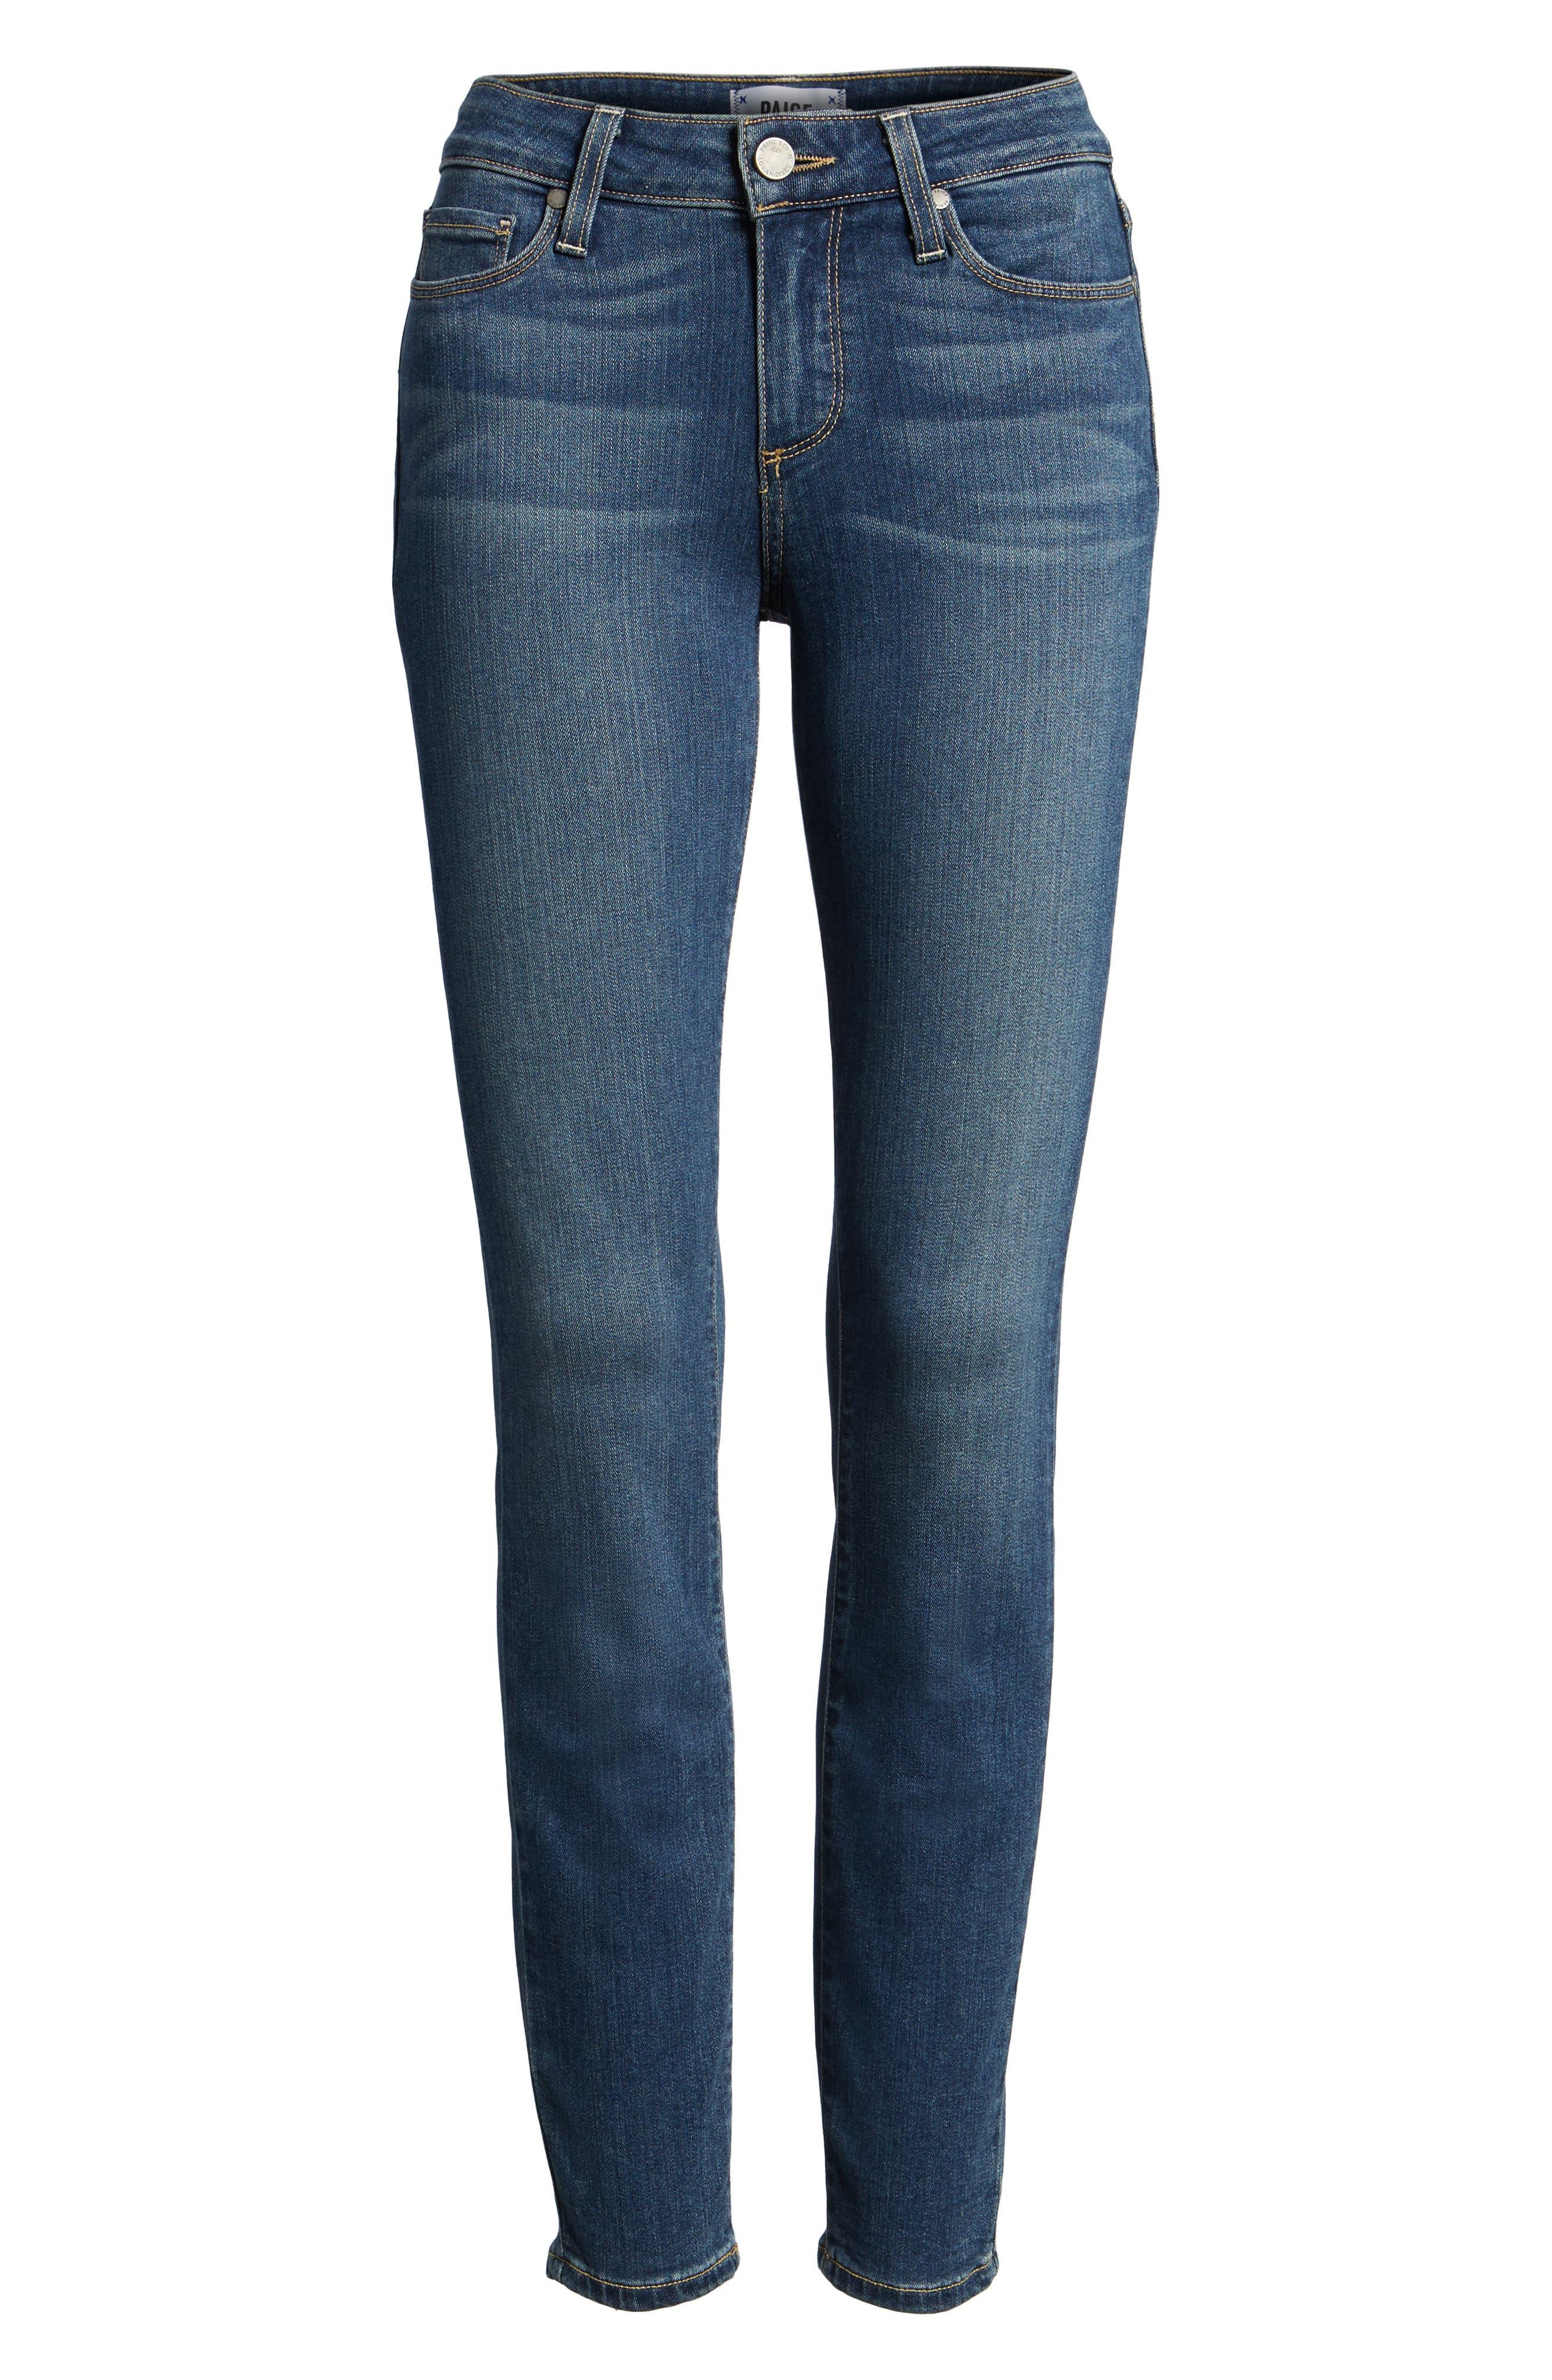 Alternate Image 4  - PAIGE Transcend - Verdugo Ankle Skinny Jeans (Tristan)